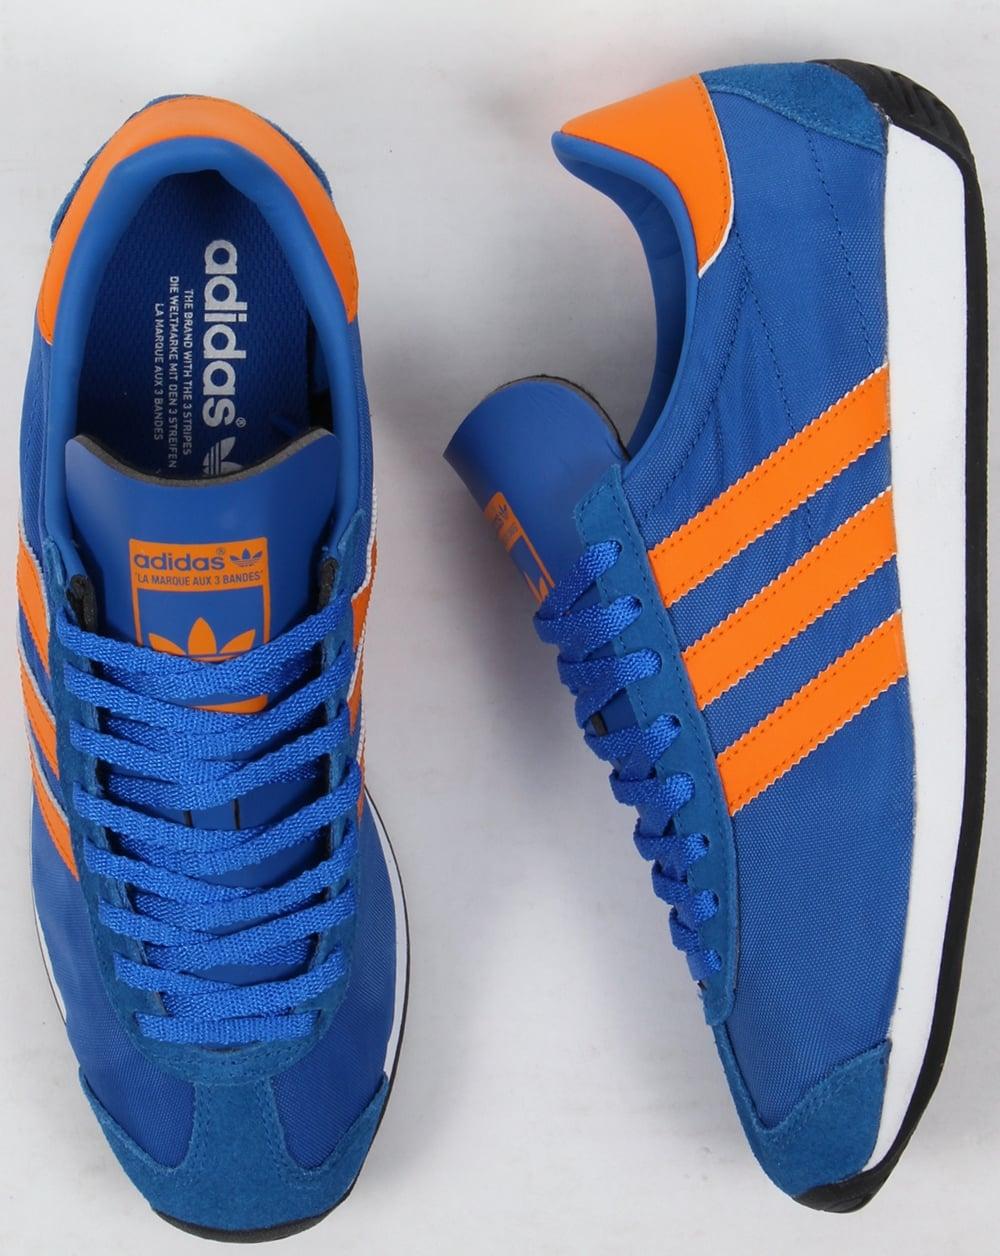 adidas trainers blue with orange